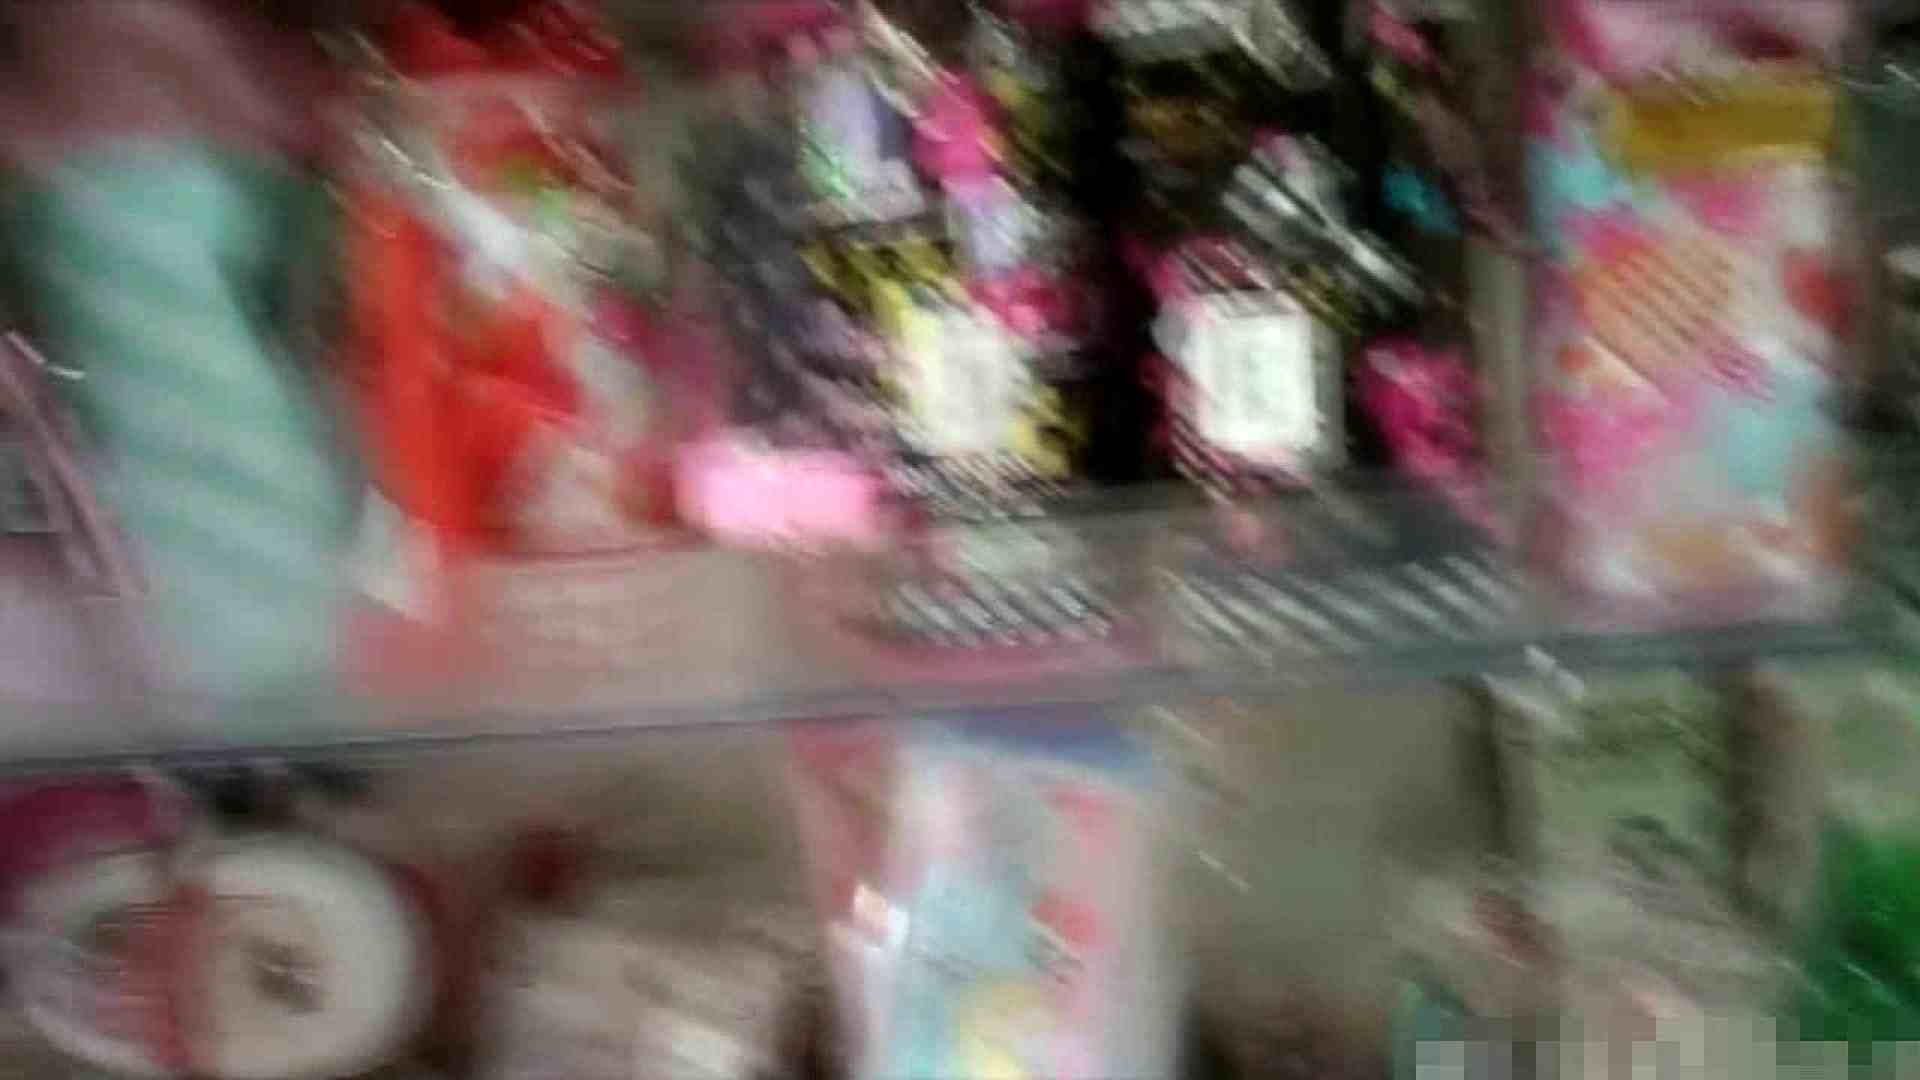 NO.5 意外に豊満な胸の雑貨屋で物色中のお女市さん 巨乳 ヌード画像 72画像 11